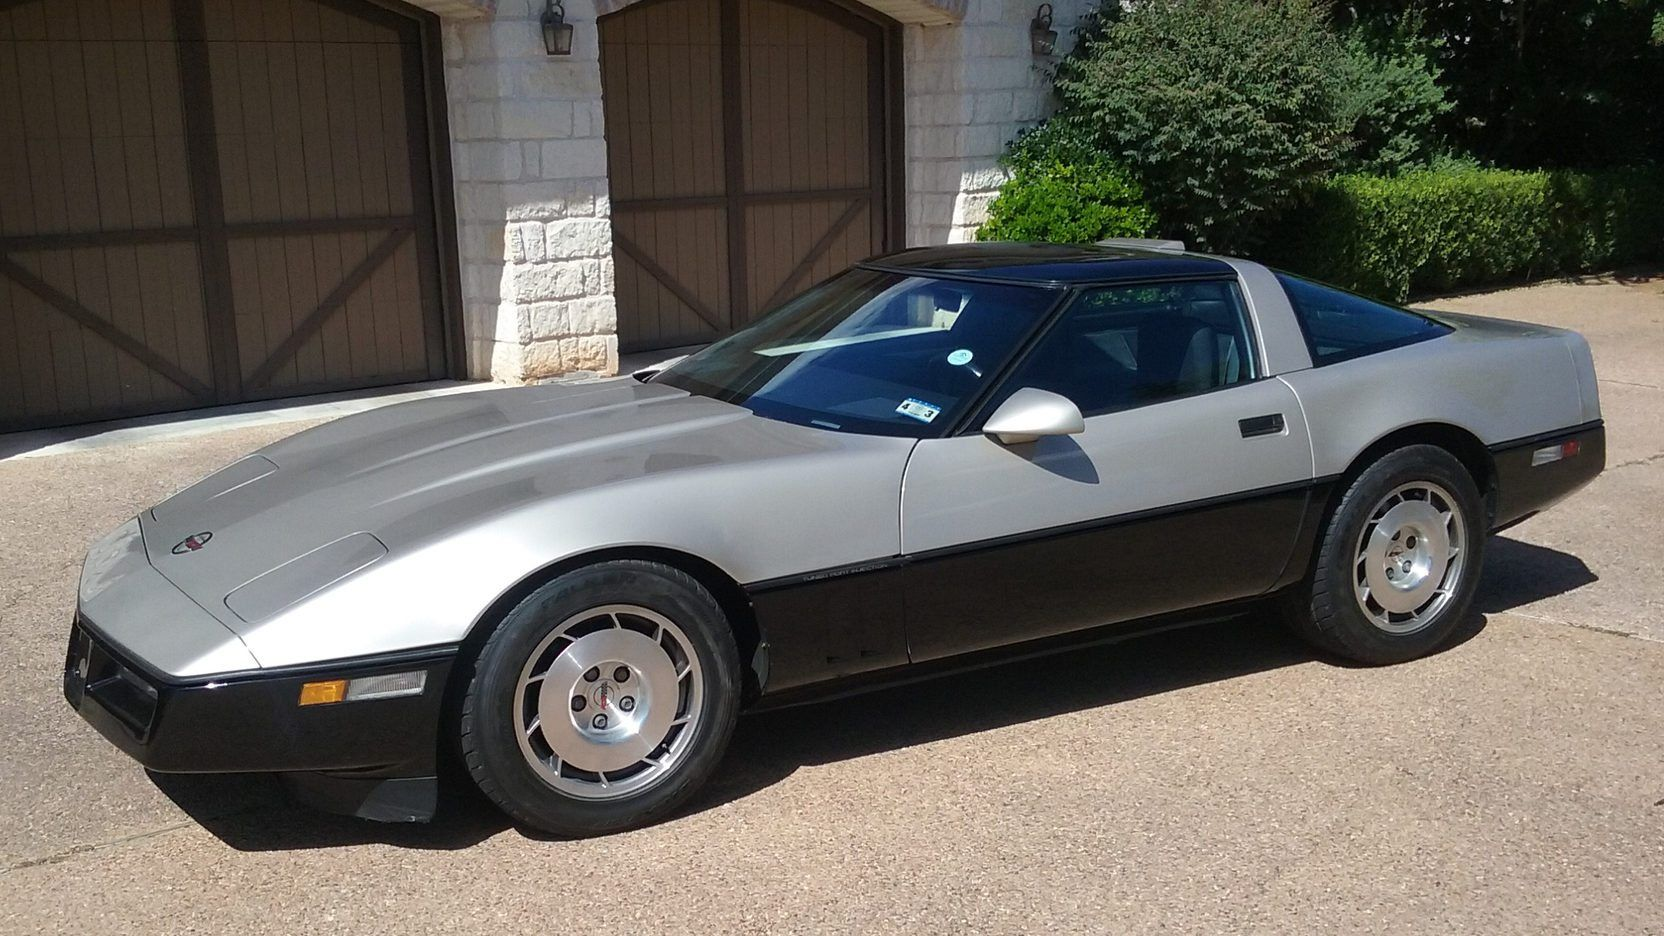 1986 C4 Corvette Image Gallery Pictures Corvette